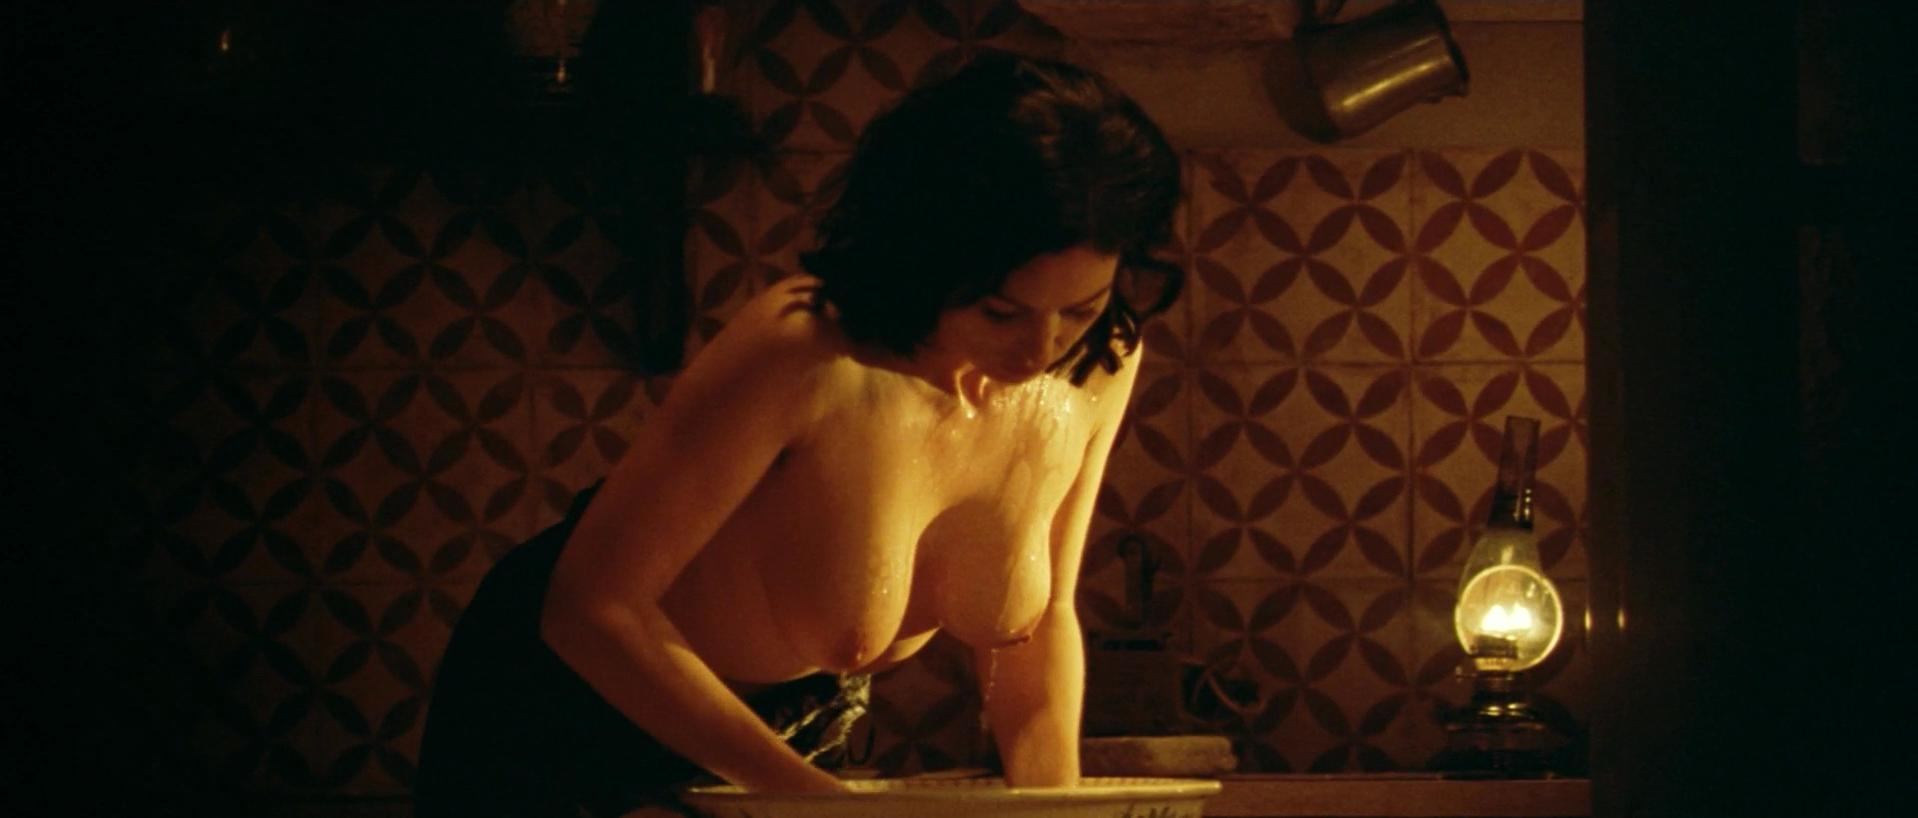 Monica bellucci nude hot malena photos 795